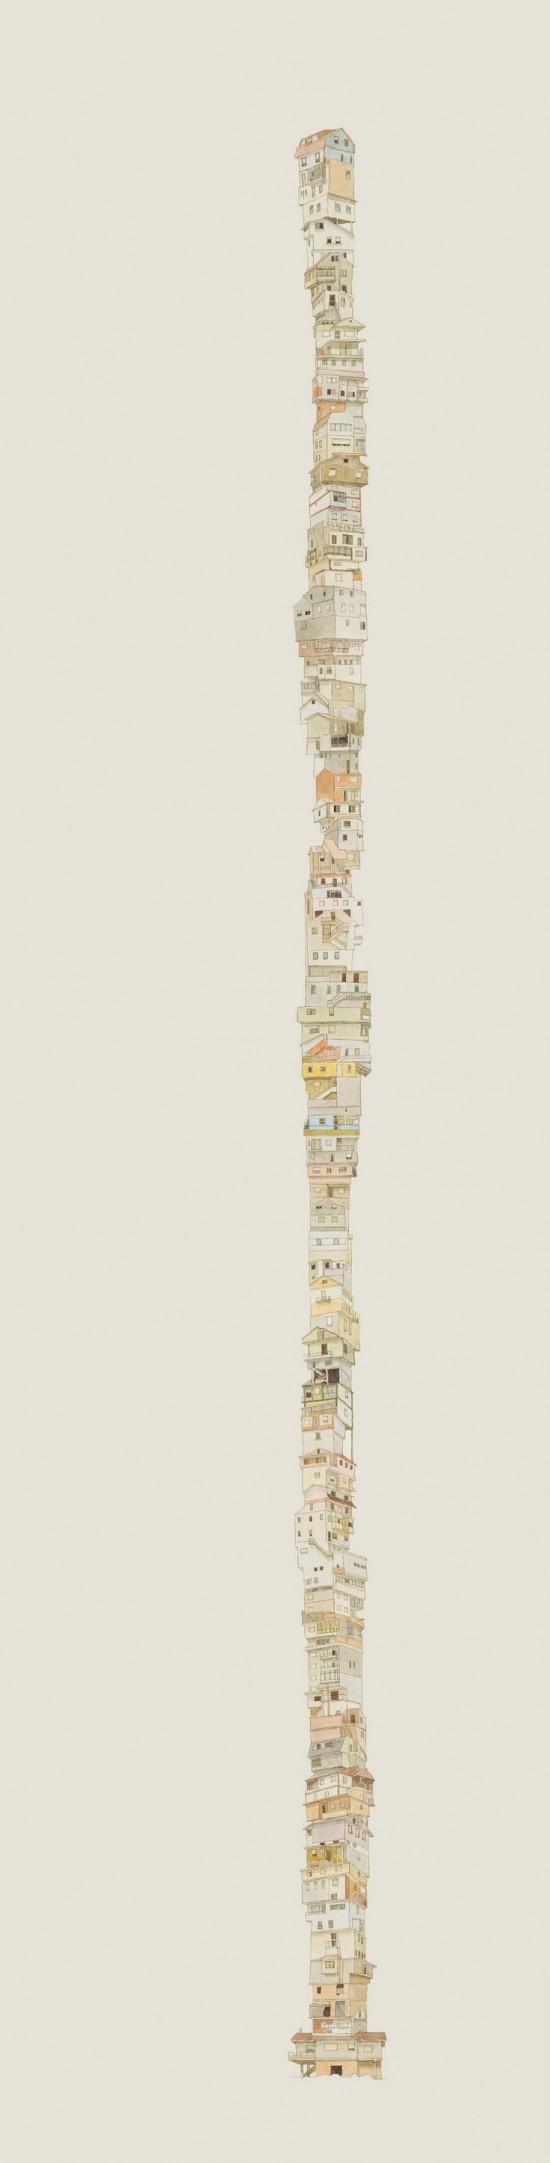 Elena Fernandez Prada - Architectural Illustration - Stacked Houses Art | Small for Big